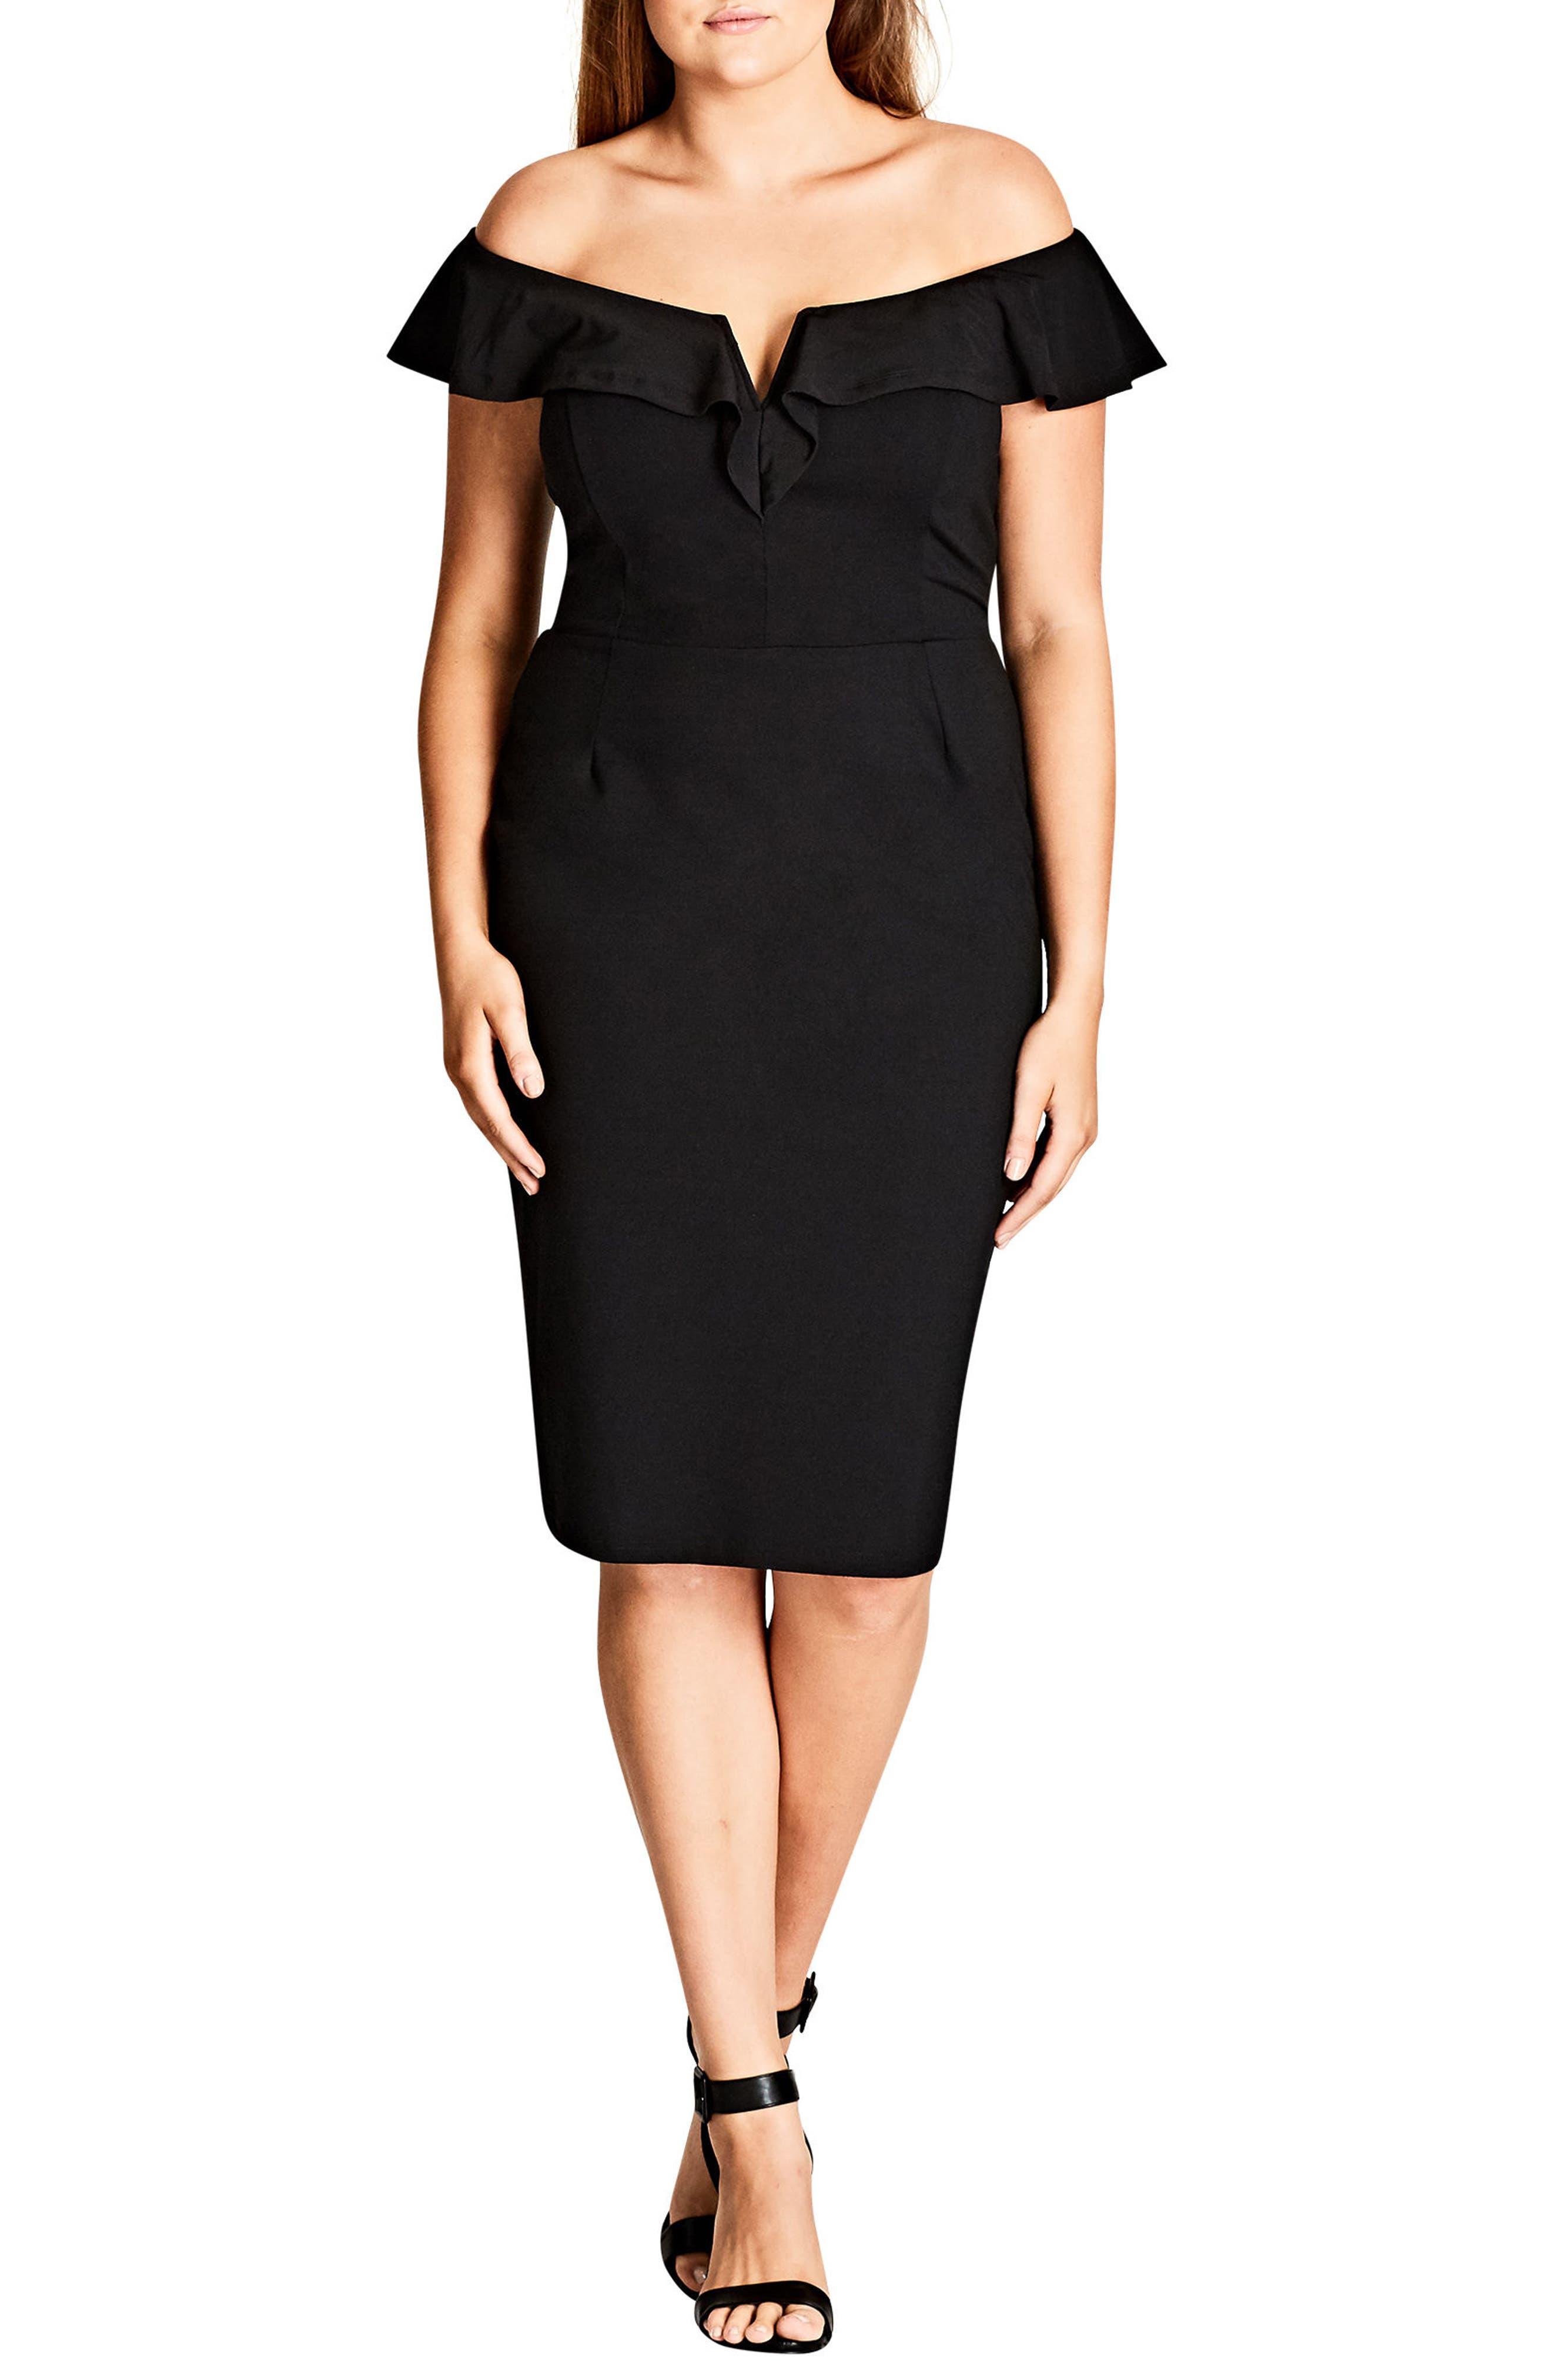 City Chic Plunge Frill Sheath Dress (Plus Size)